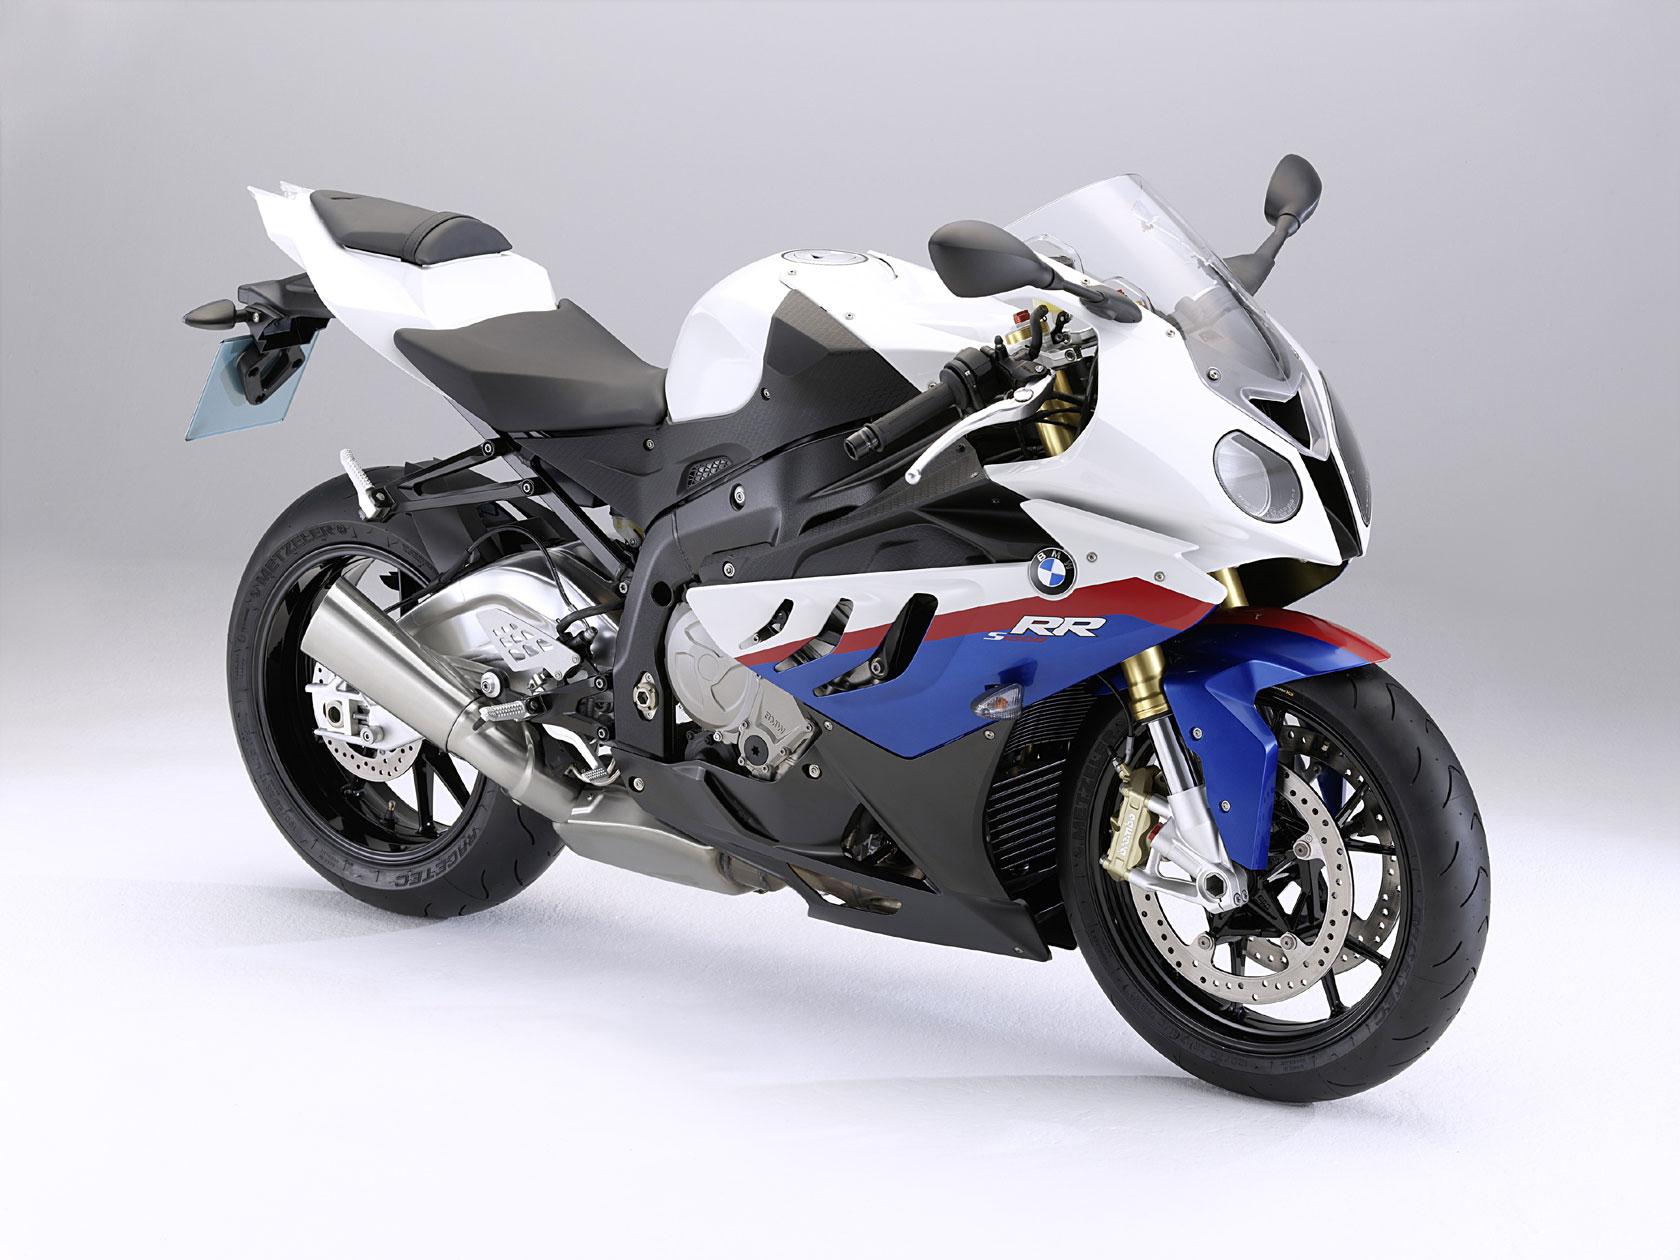 Visordown readers' top 10 non-Japanese sports bikes